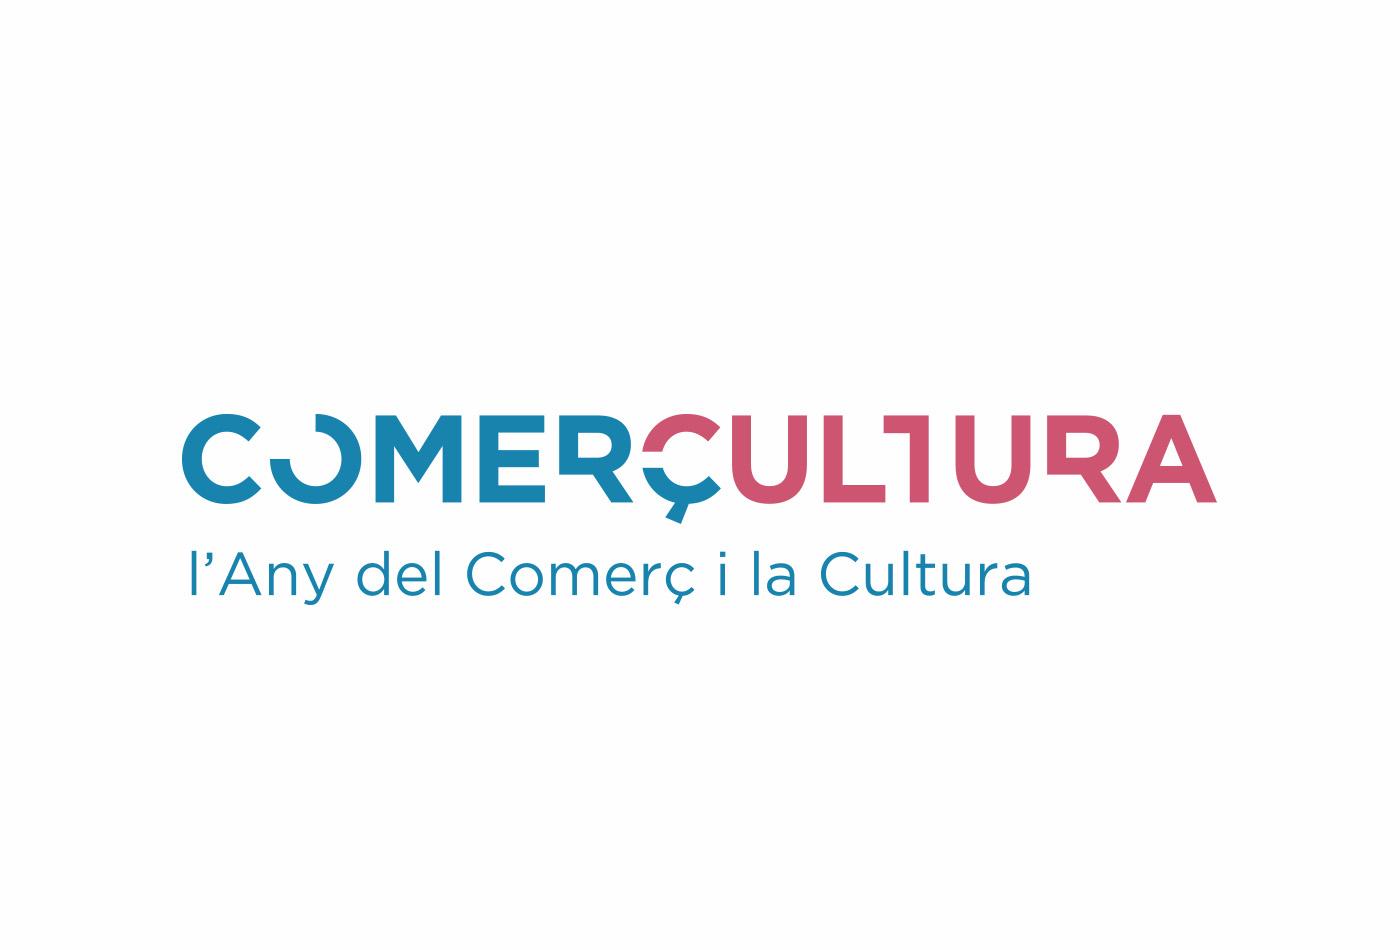 logo-comercultura-disseny-creartiva